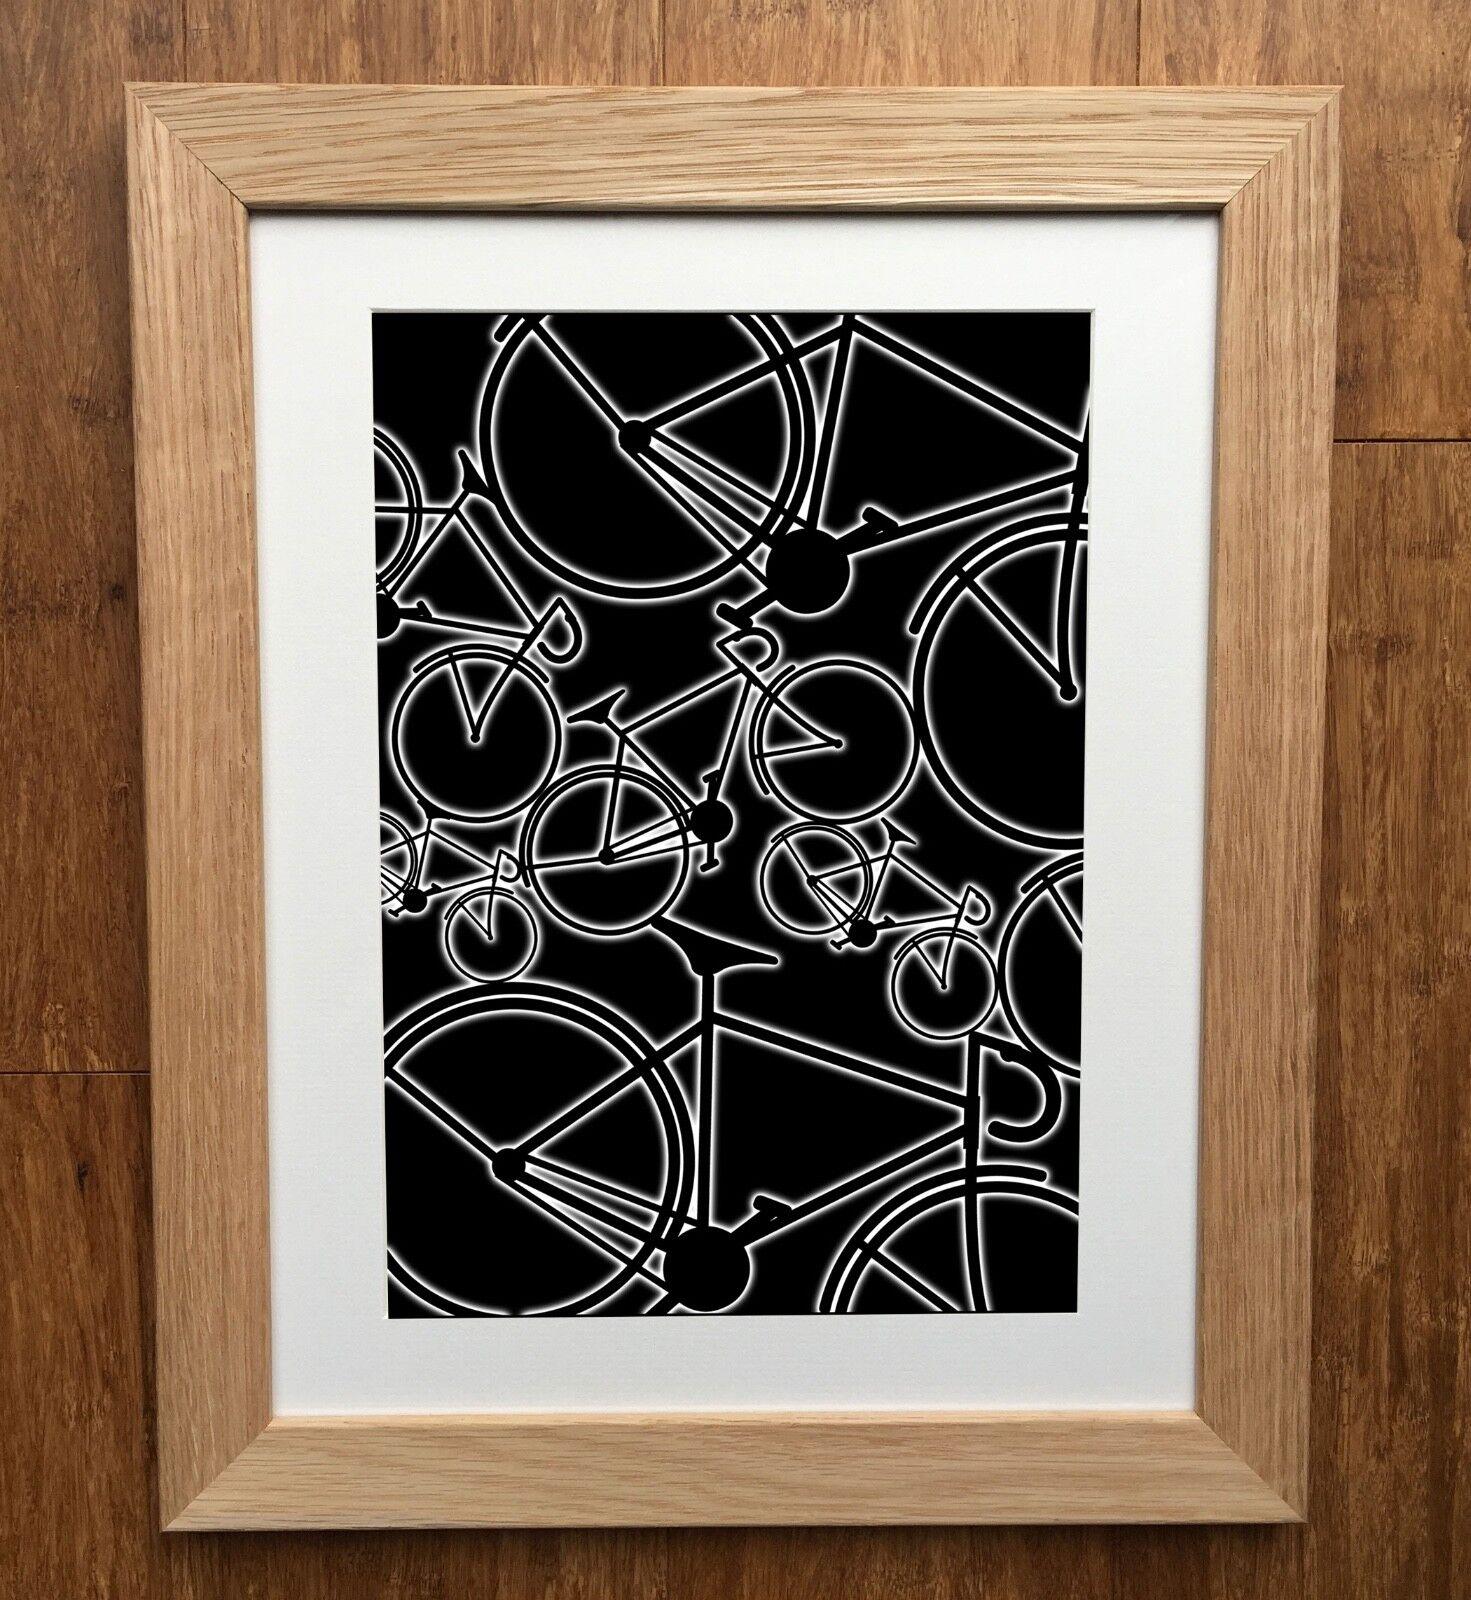 Cycling Print - Road Bikes - Cycling Gift - Free Post - High Quality - Bike